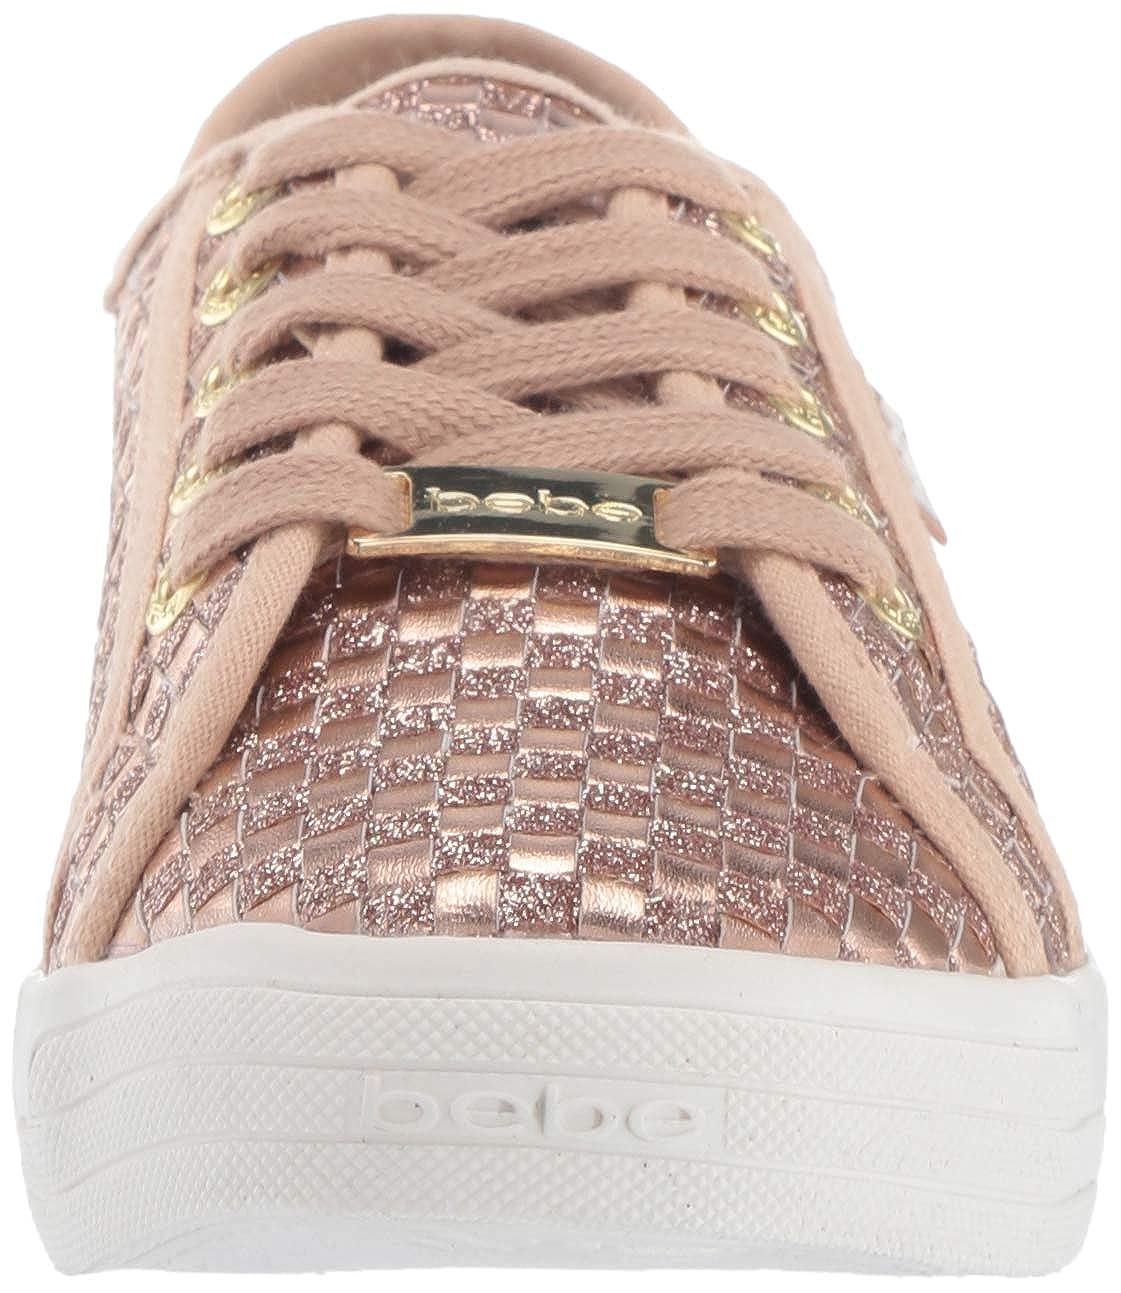 bebe Womens Dorey Sneaker